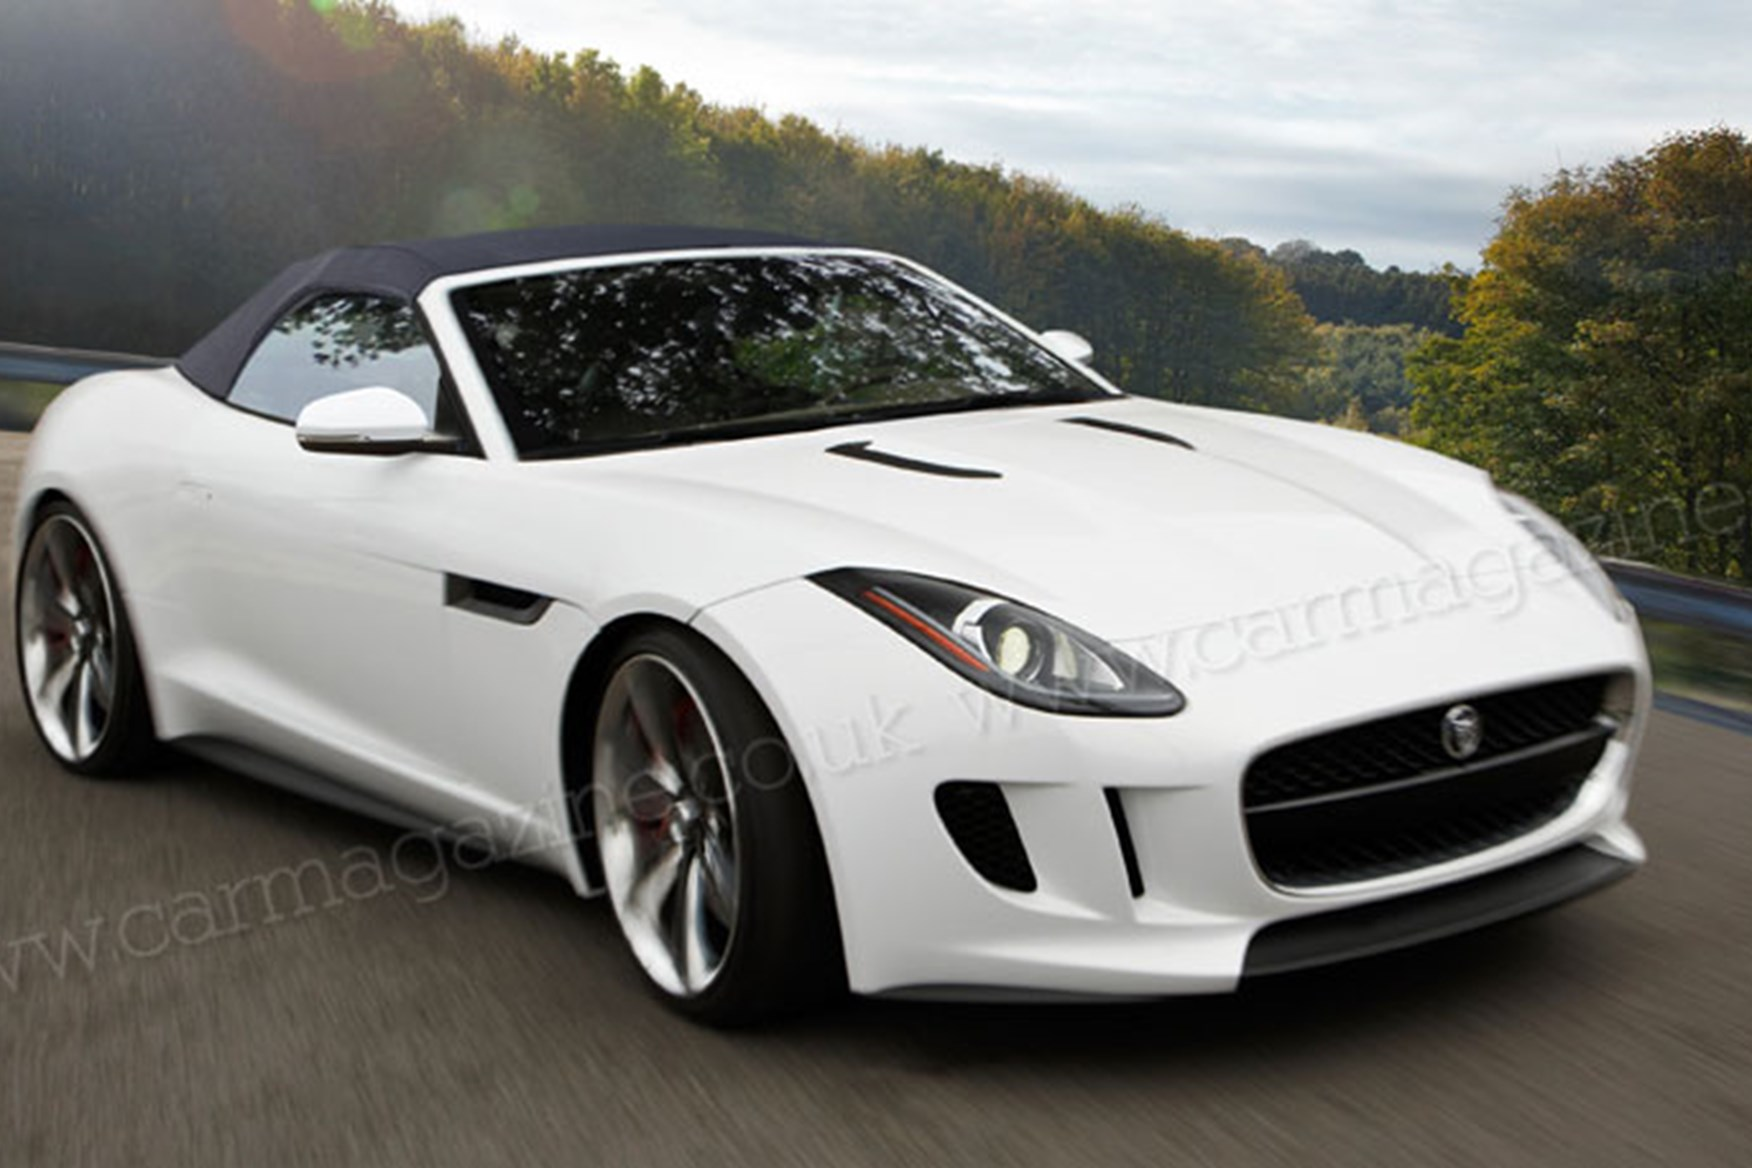 ... Artistu0027s Impression Of The New 2013 Jaguar F Type ... Amazing Ideas